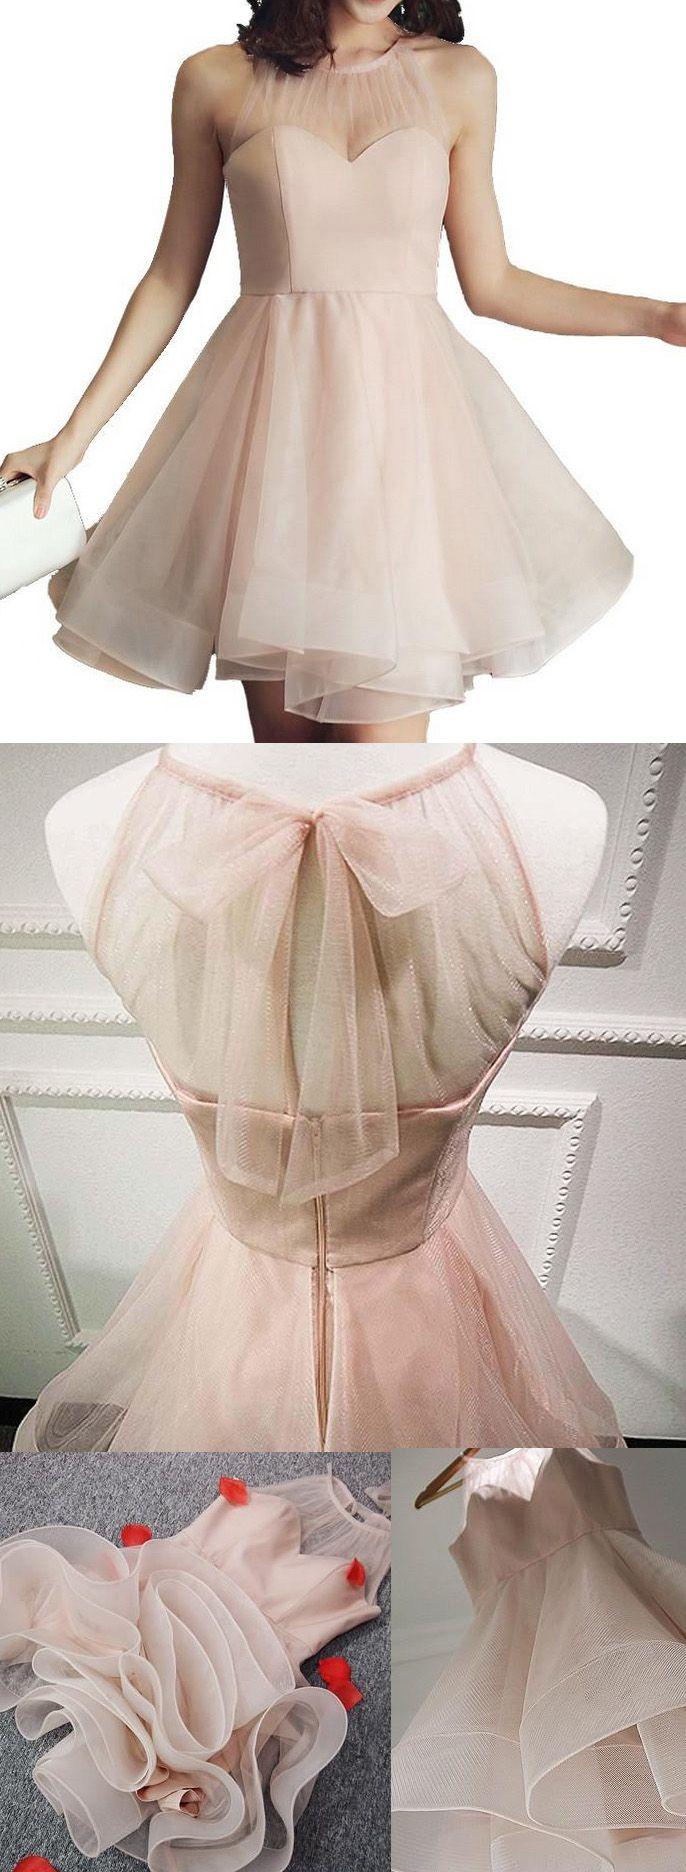 Bowknot prom dresses pink alineprincess prom dresses short pink